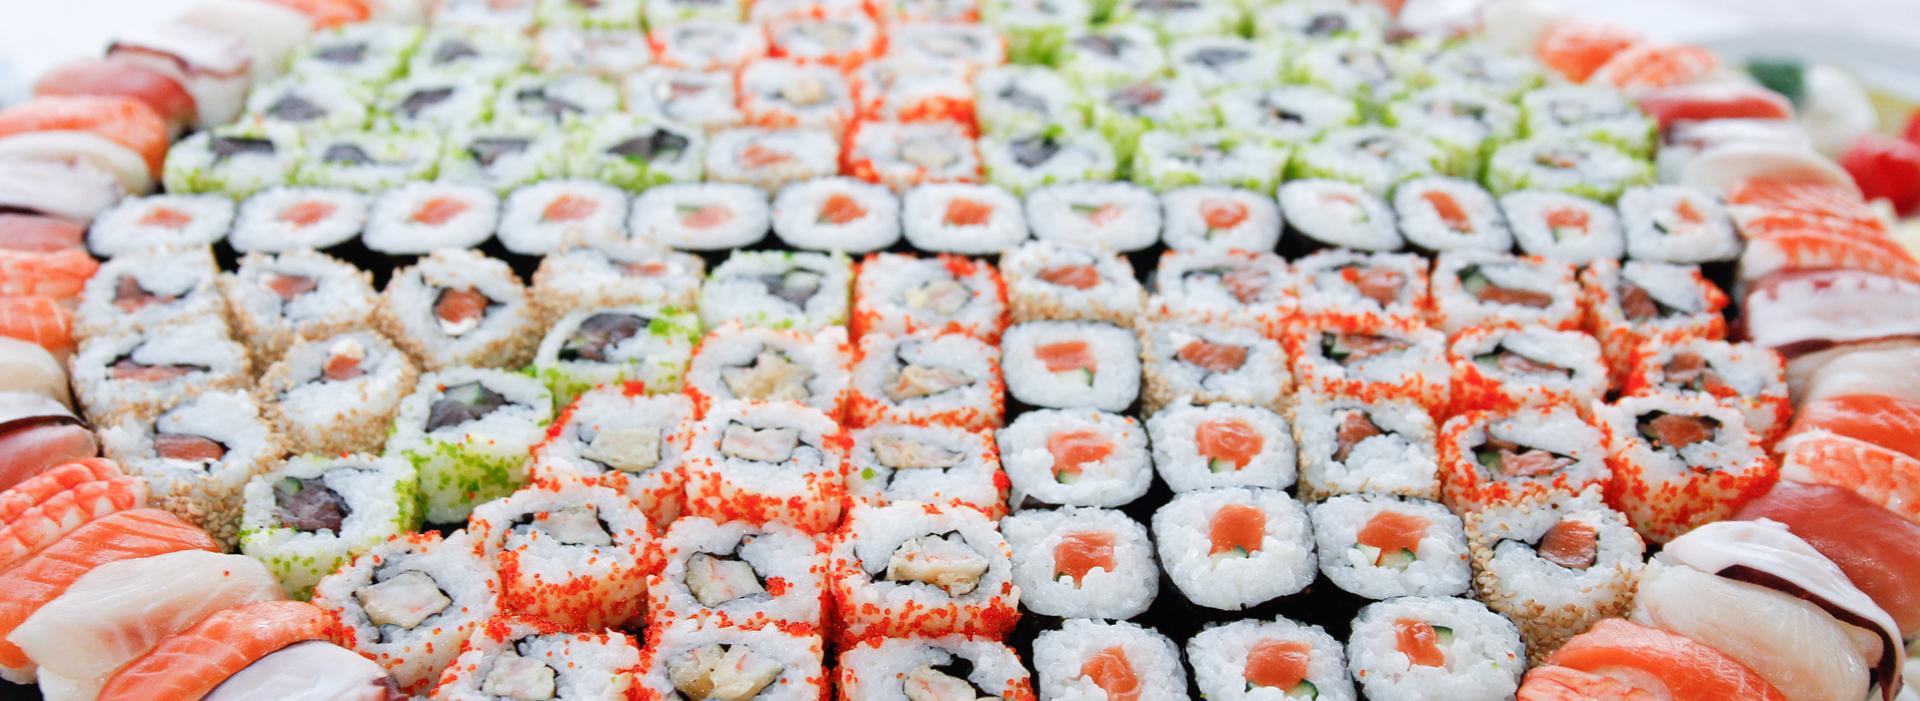 sushi-furshet.jpg